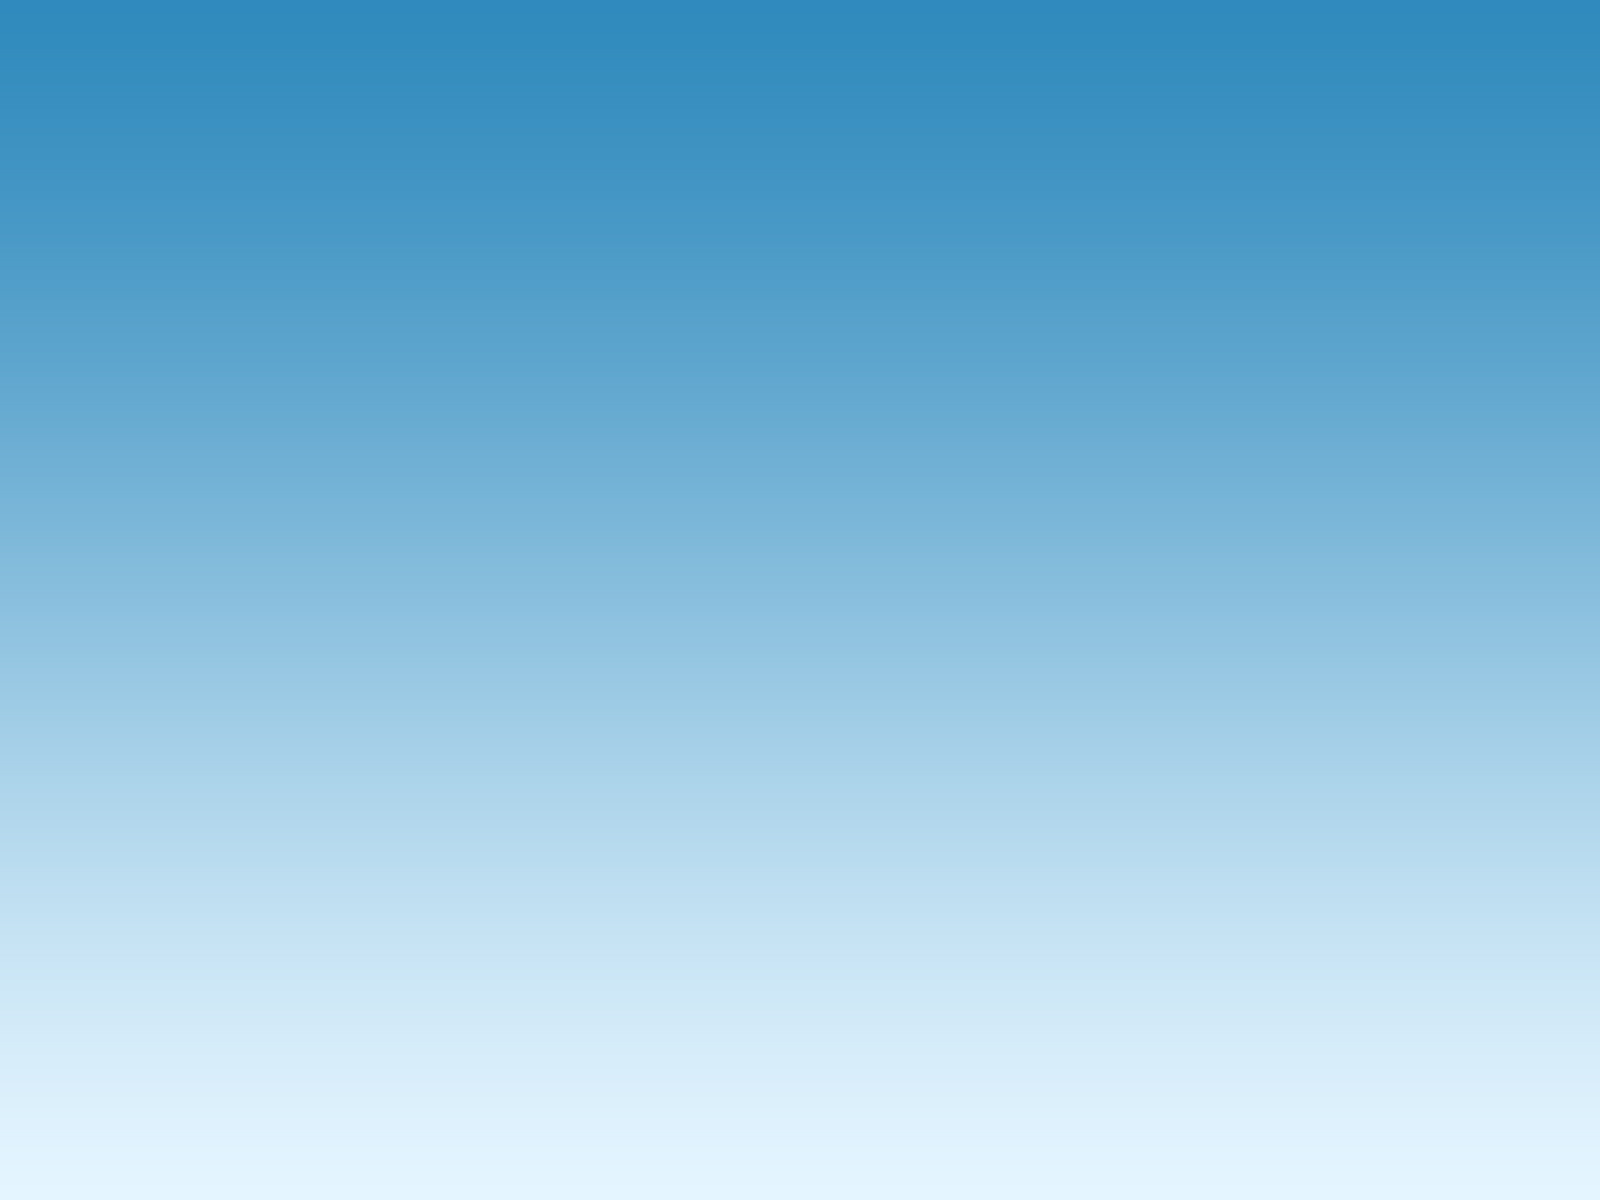 Konsep 29 Gradasi Warna Biru